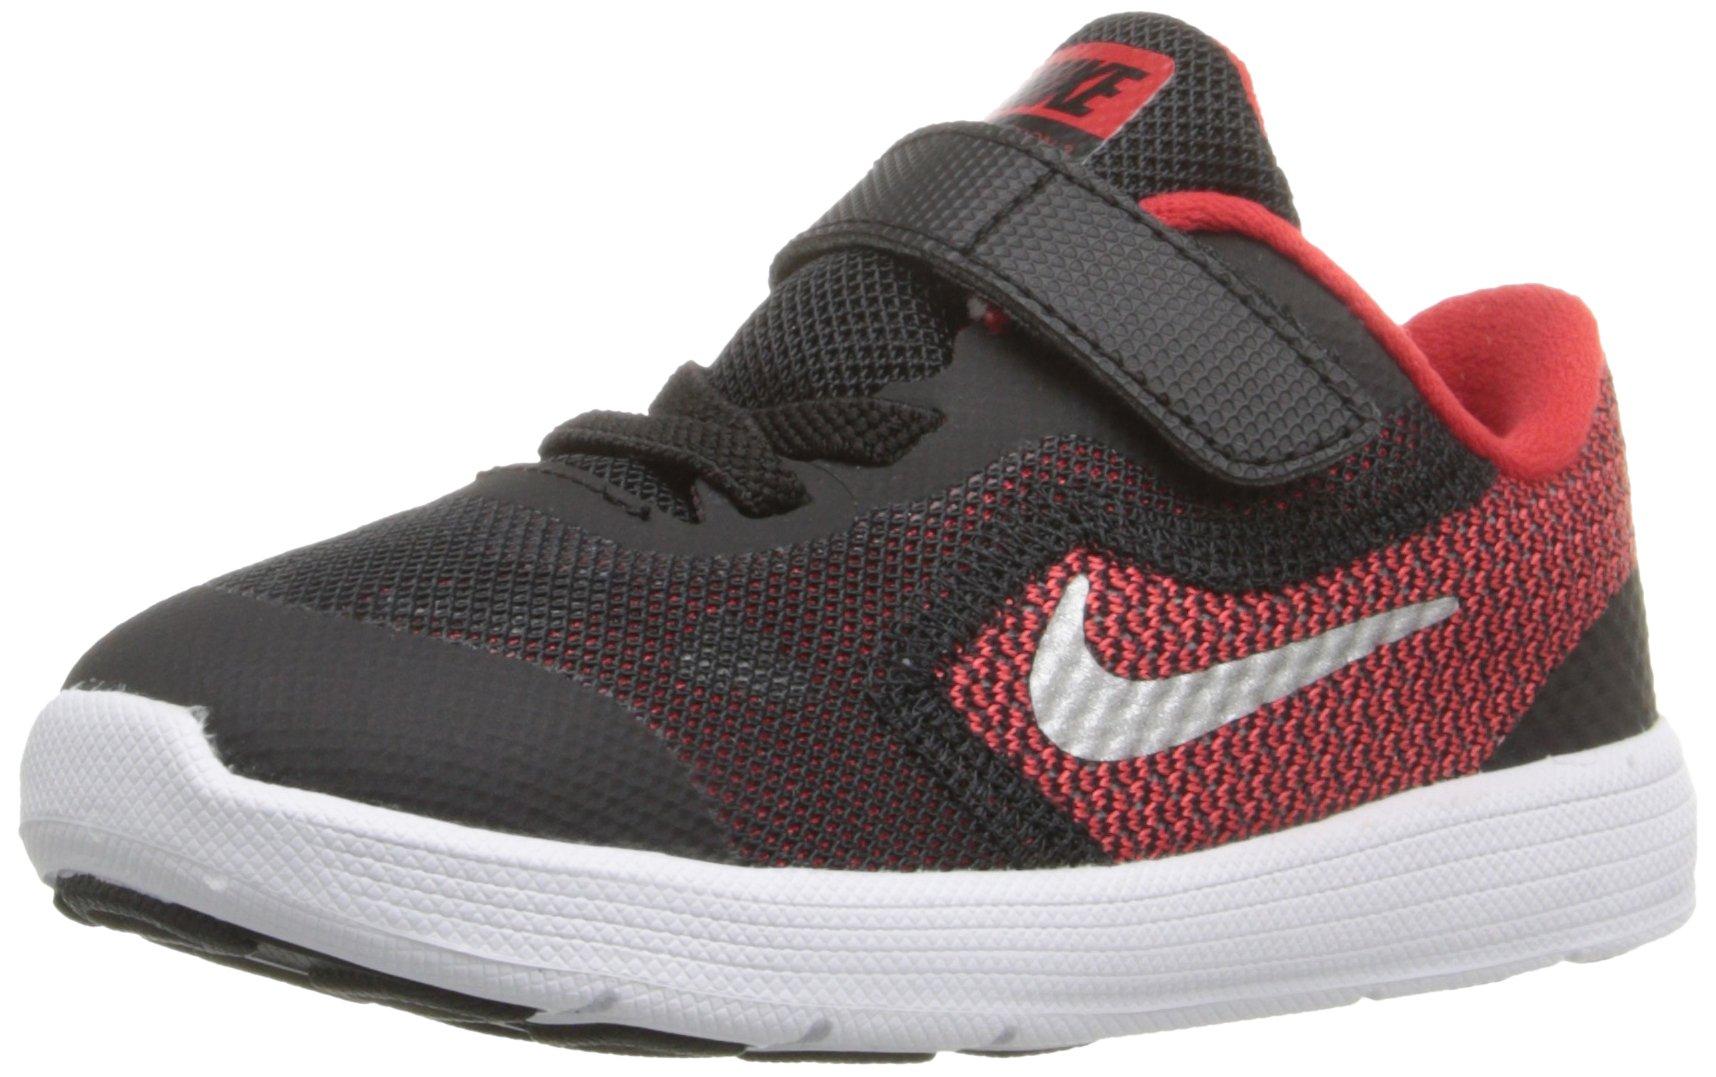 NIKE Boys' Revolution 3 Running Shoe (TDV), University Red/Metallic Silver/Black, 9 M US Toddler